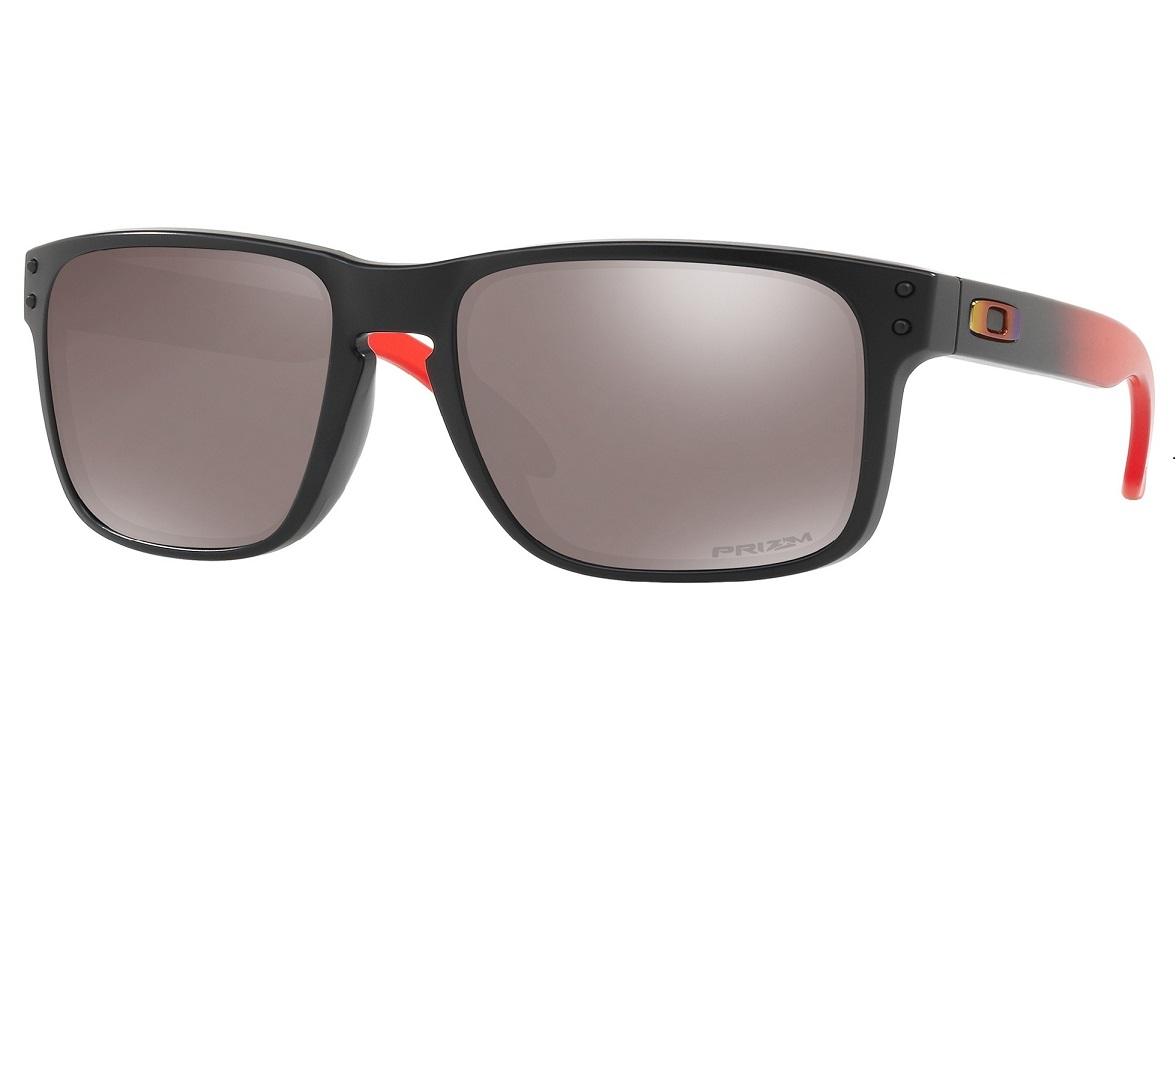 d8a71b85e1724 ... Oakley Holbrook Prizm Polarizado Oo9102-D3 Óculos de Sol. 🔍. Adicionar  aos favoritos